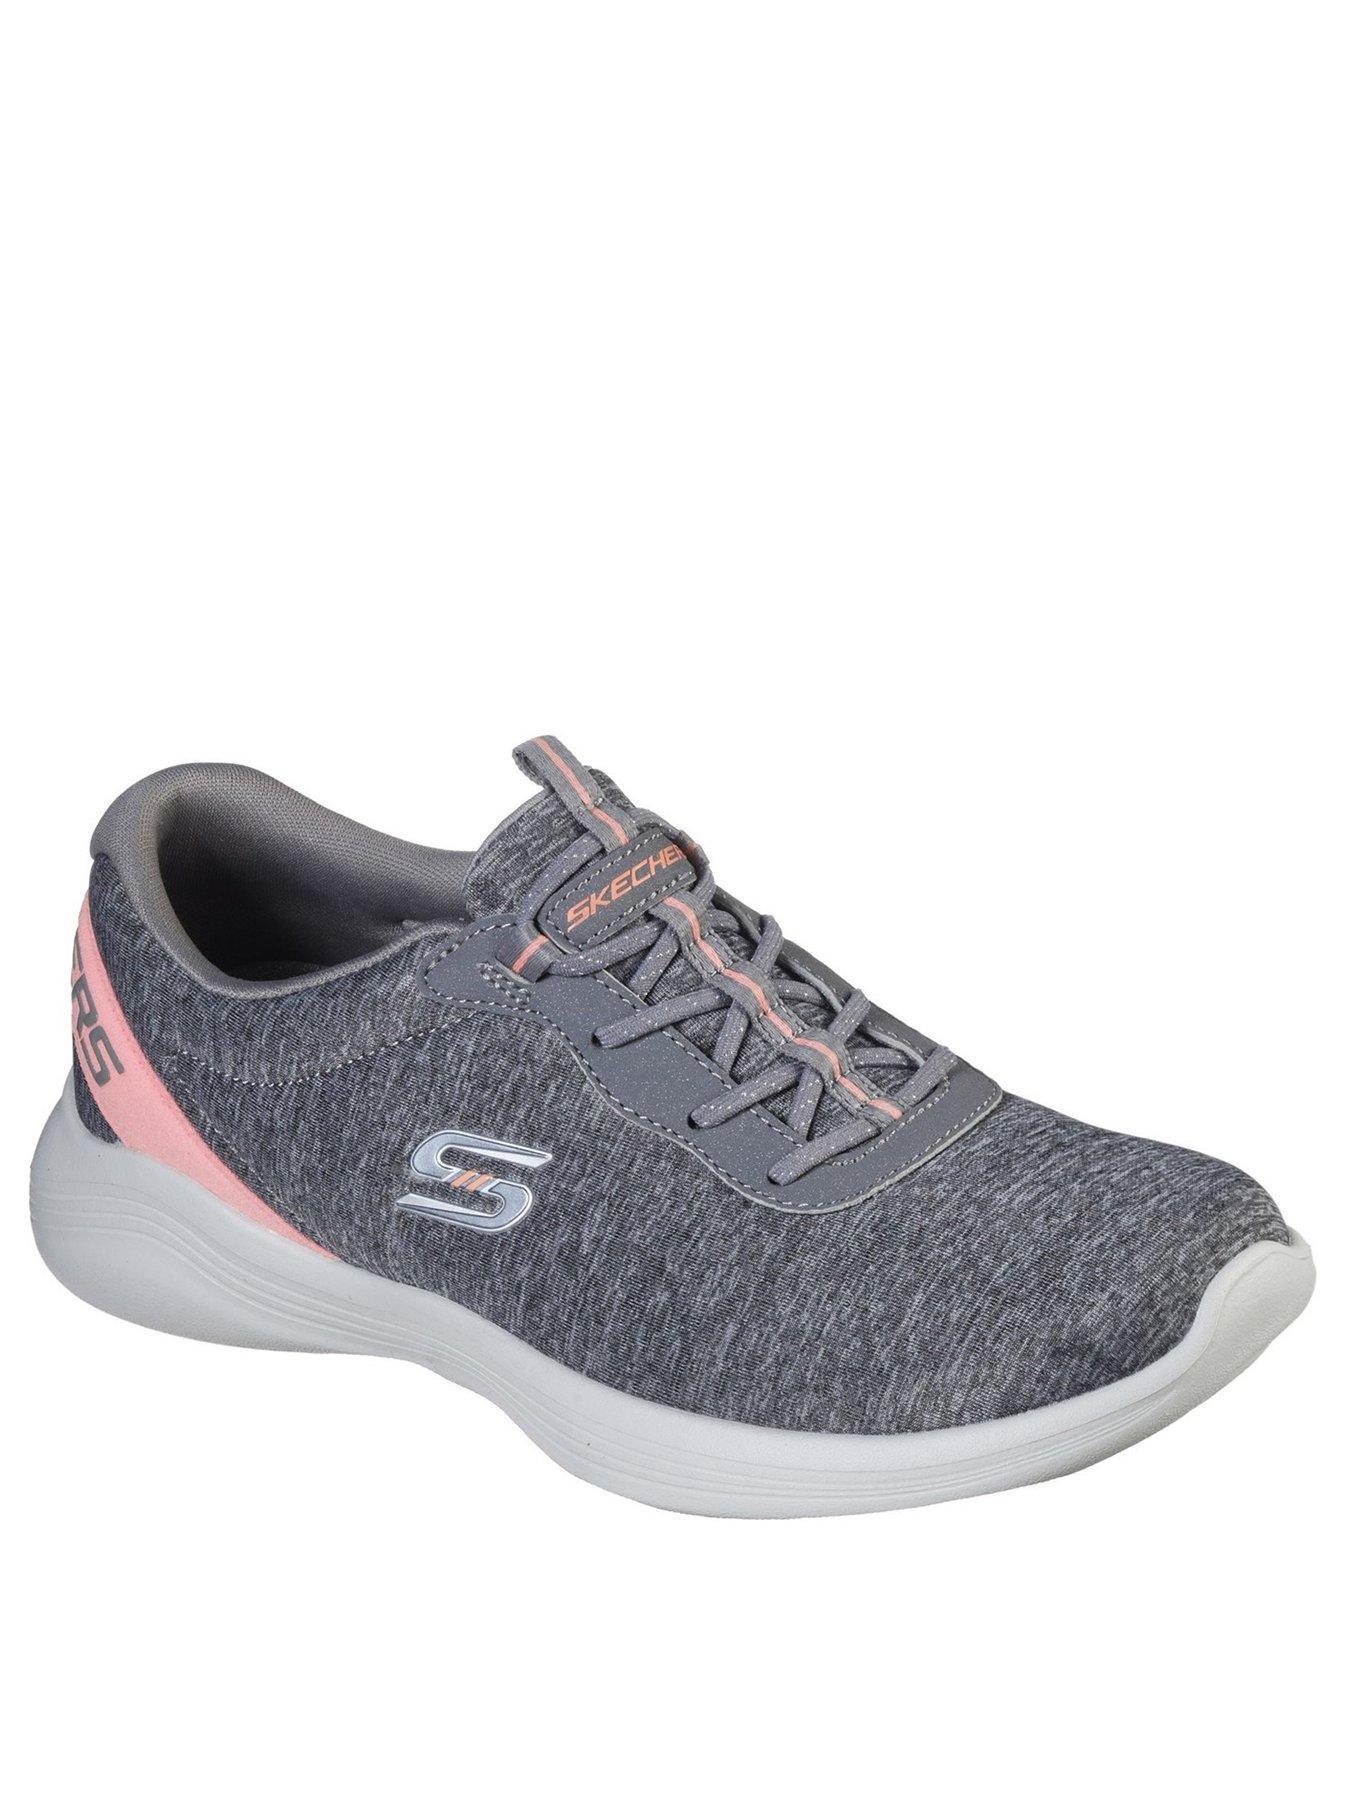 Grey | Skechers | Shoes \u0026 boots | Women